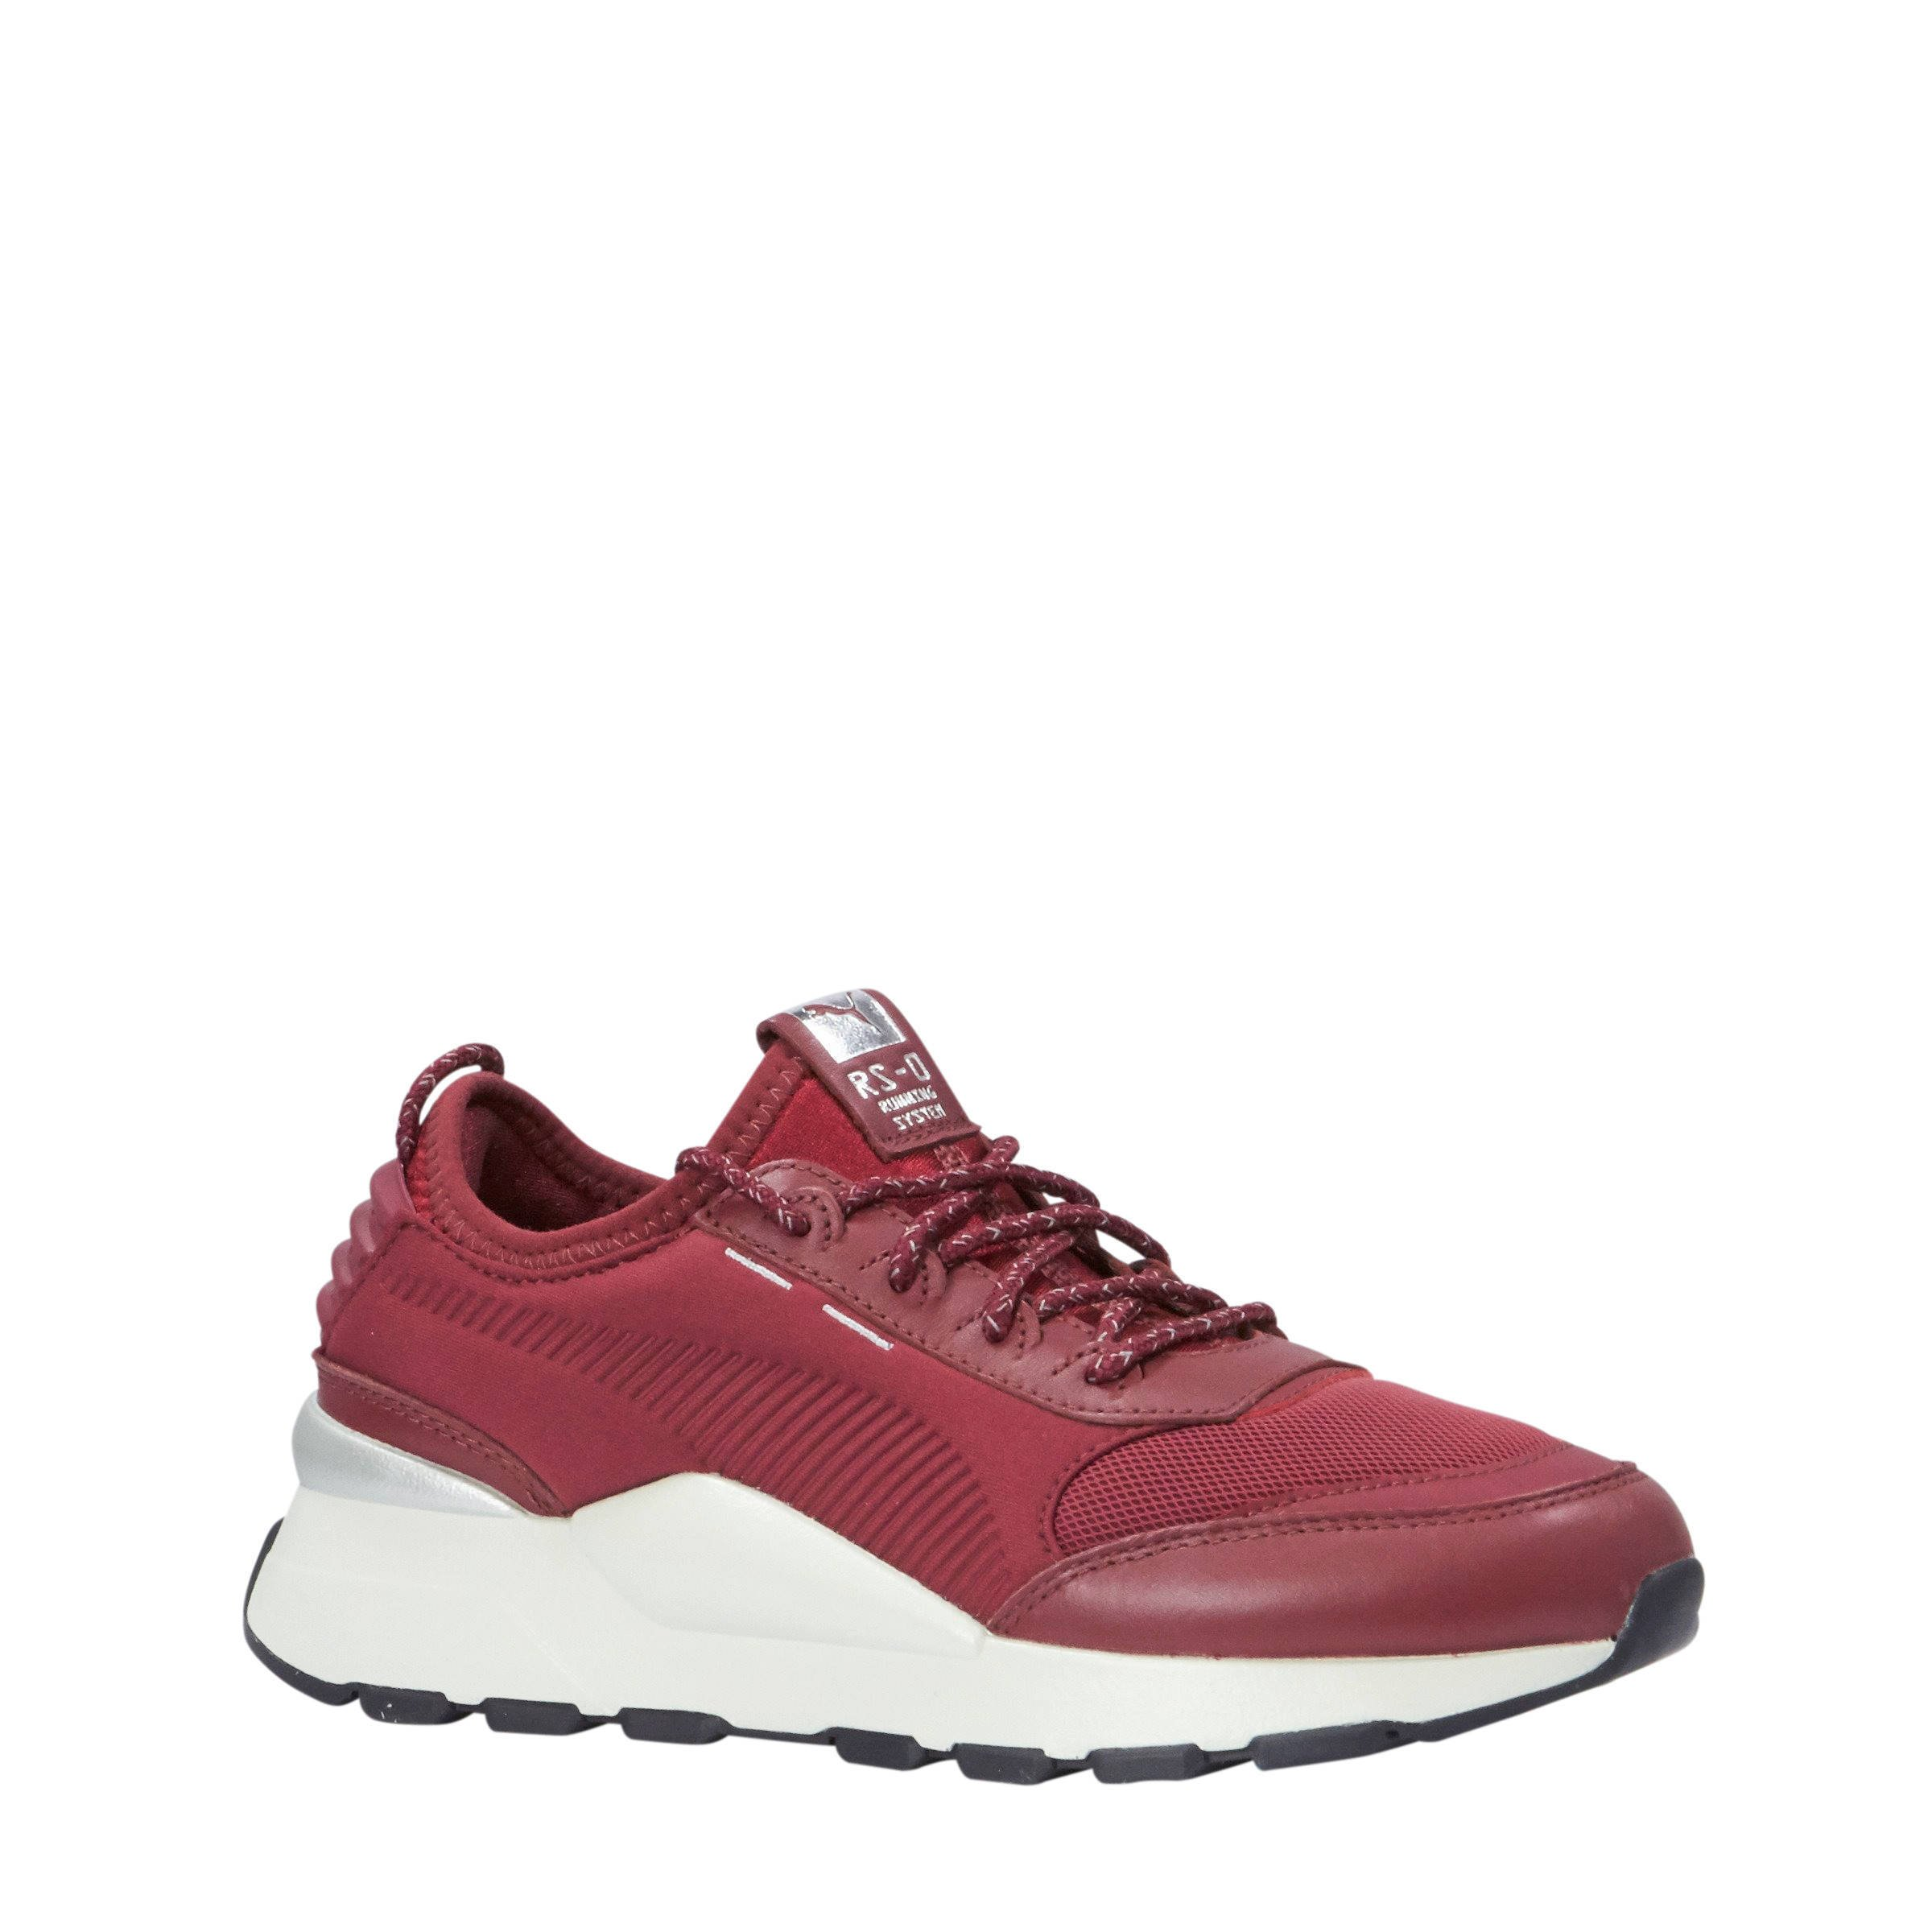 quality design 54e61 01882 Dames sneakers bij wehkamp - Gratis bezorging vanaf 20.-